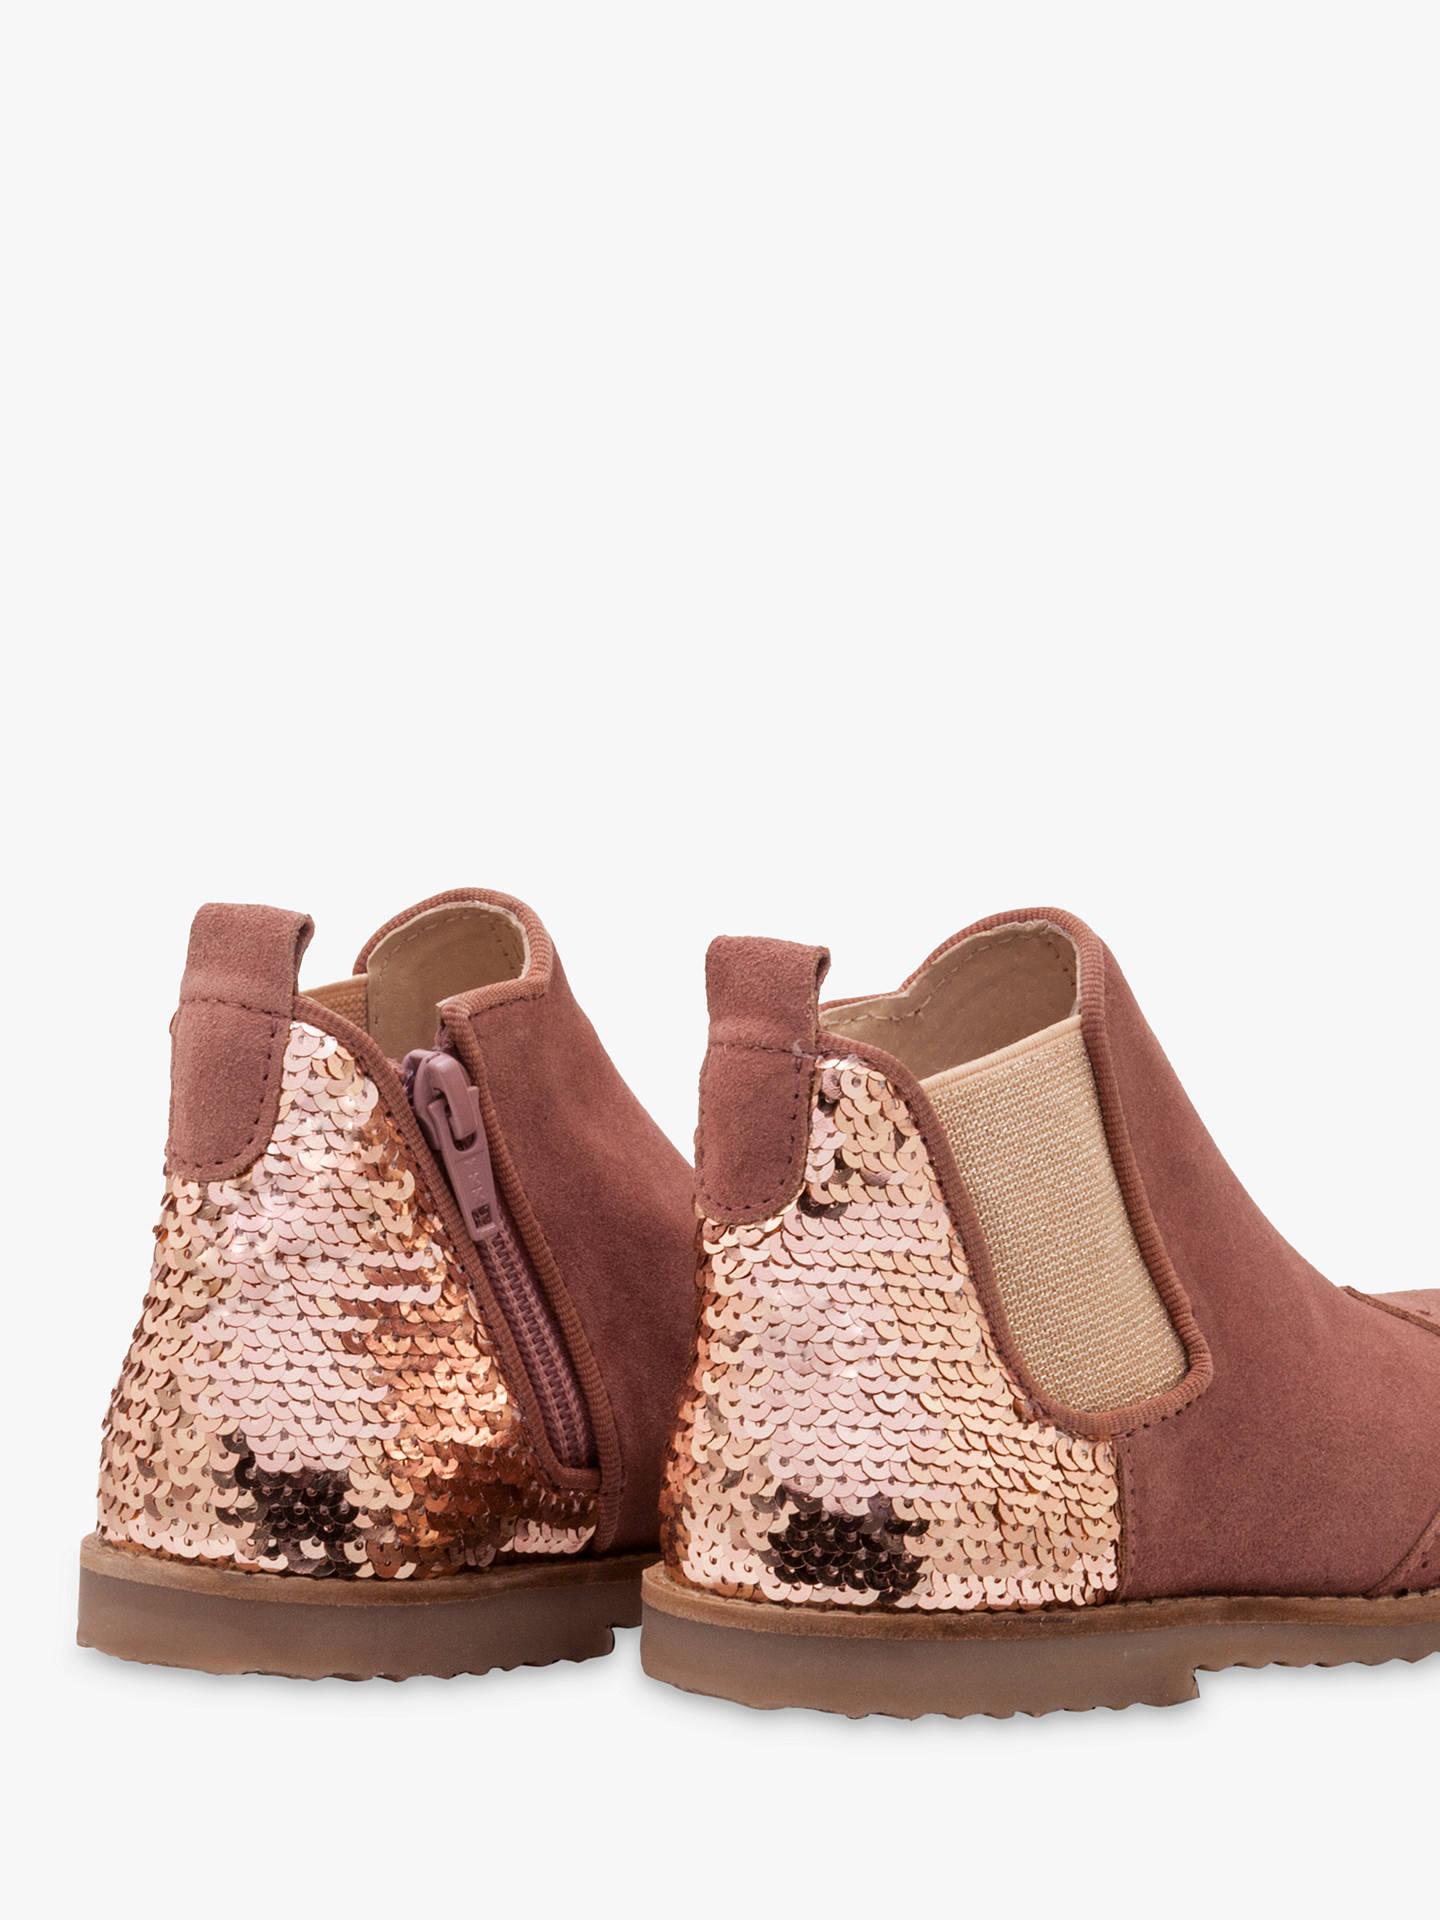 Mini Boden Children S Sequin Leather Chelsea Boots Mink